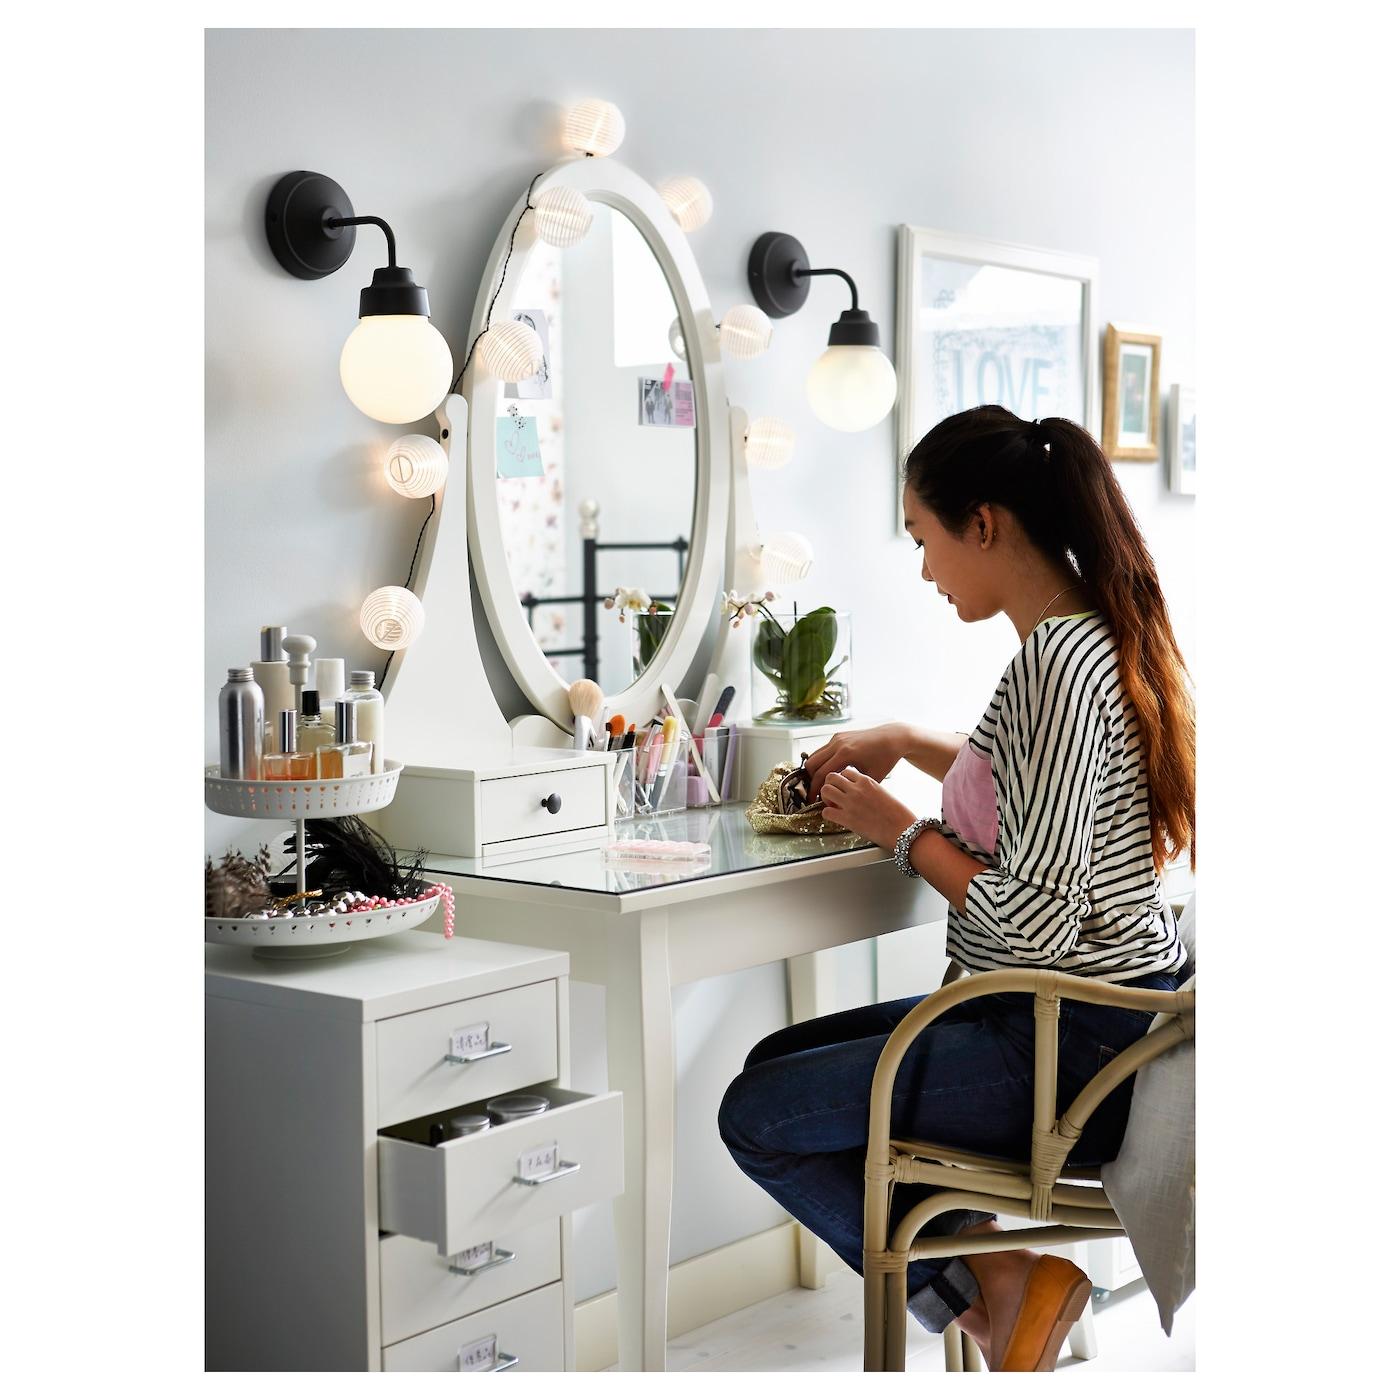 hemnes toilettafel met spiegel wit 100 x 50 cm ikea. Black Bedroom Furniture Sets. Home Design Ideas